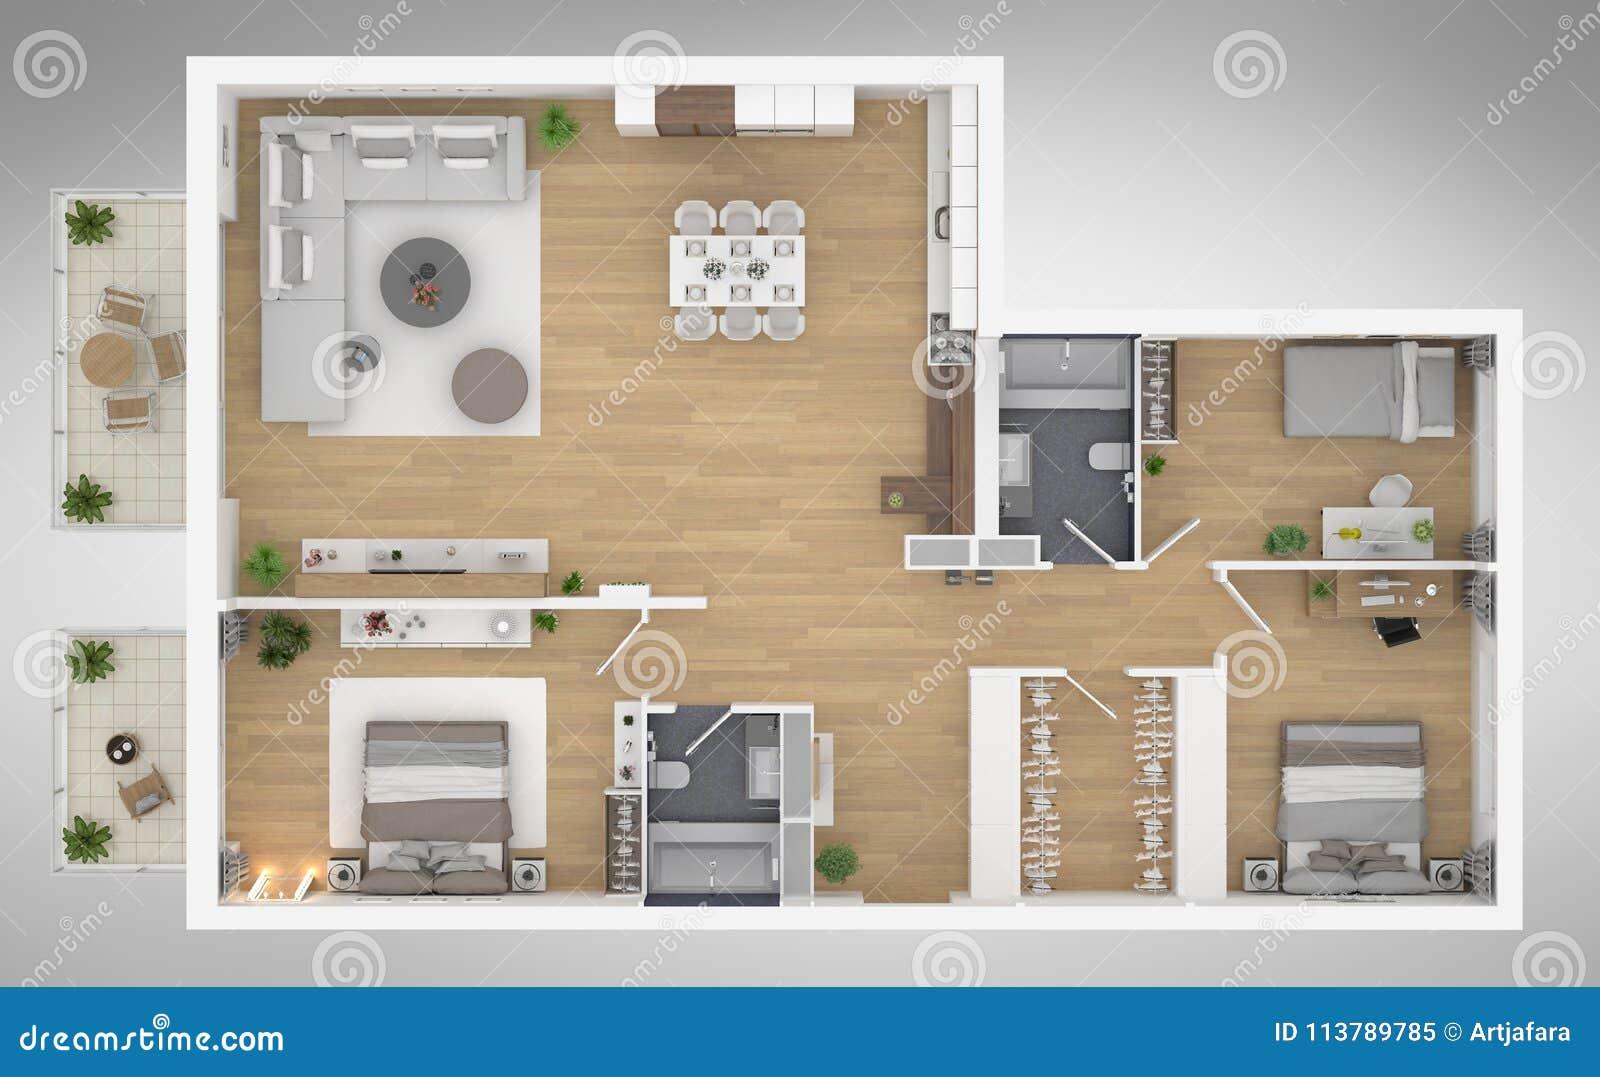 Home floor plan top view 3D illustration